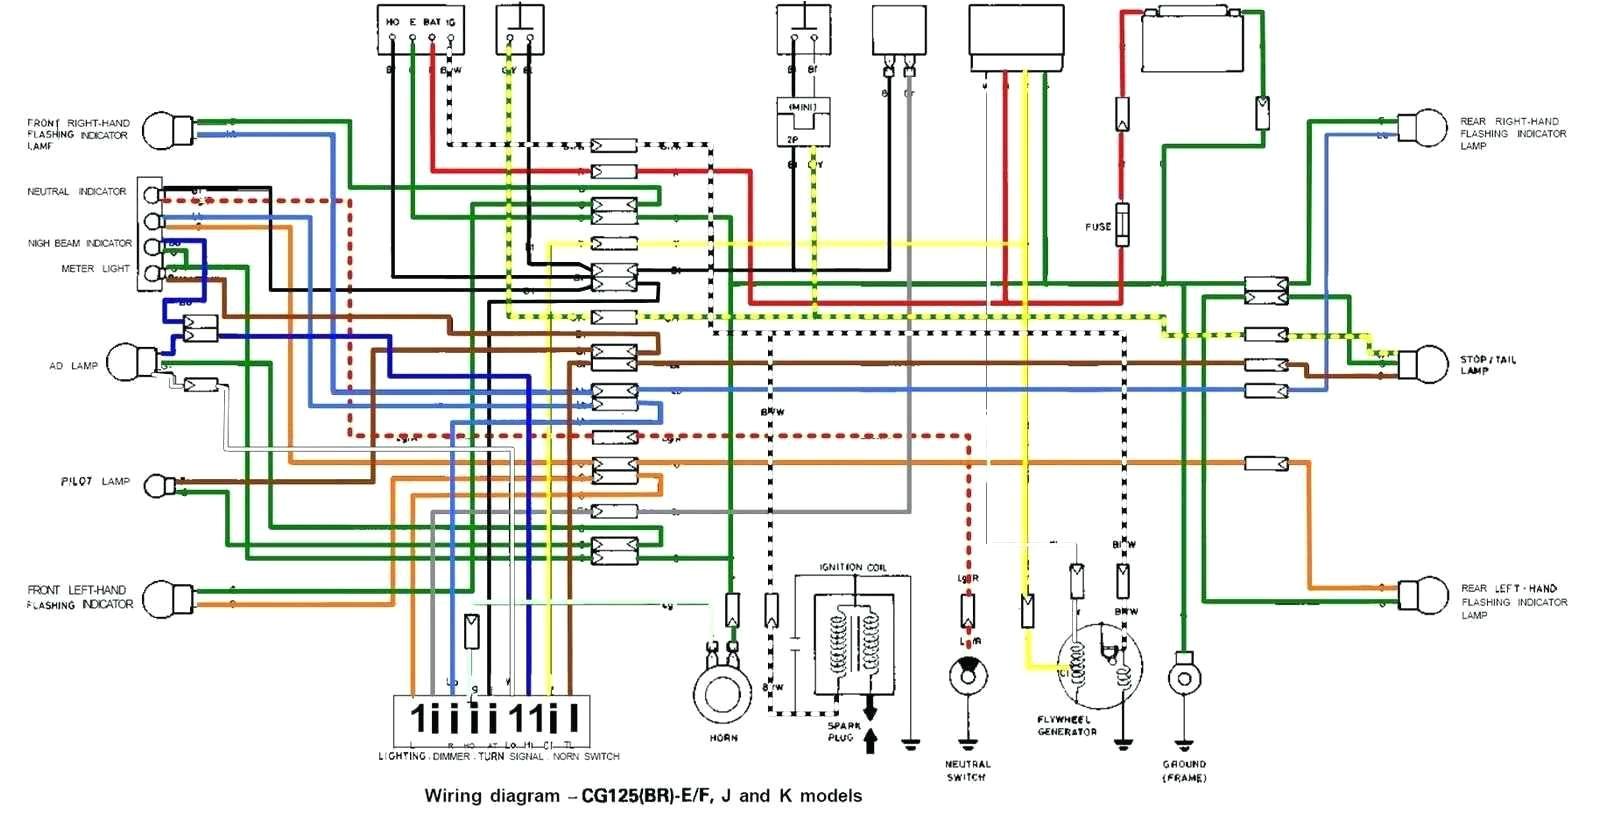 honda 125 wiring diagram data diagram schematic honda xrm 125 wiring diagram photography cheat sheets honda